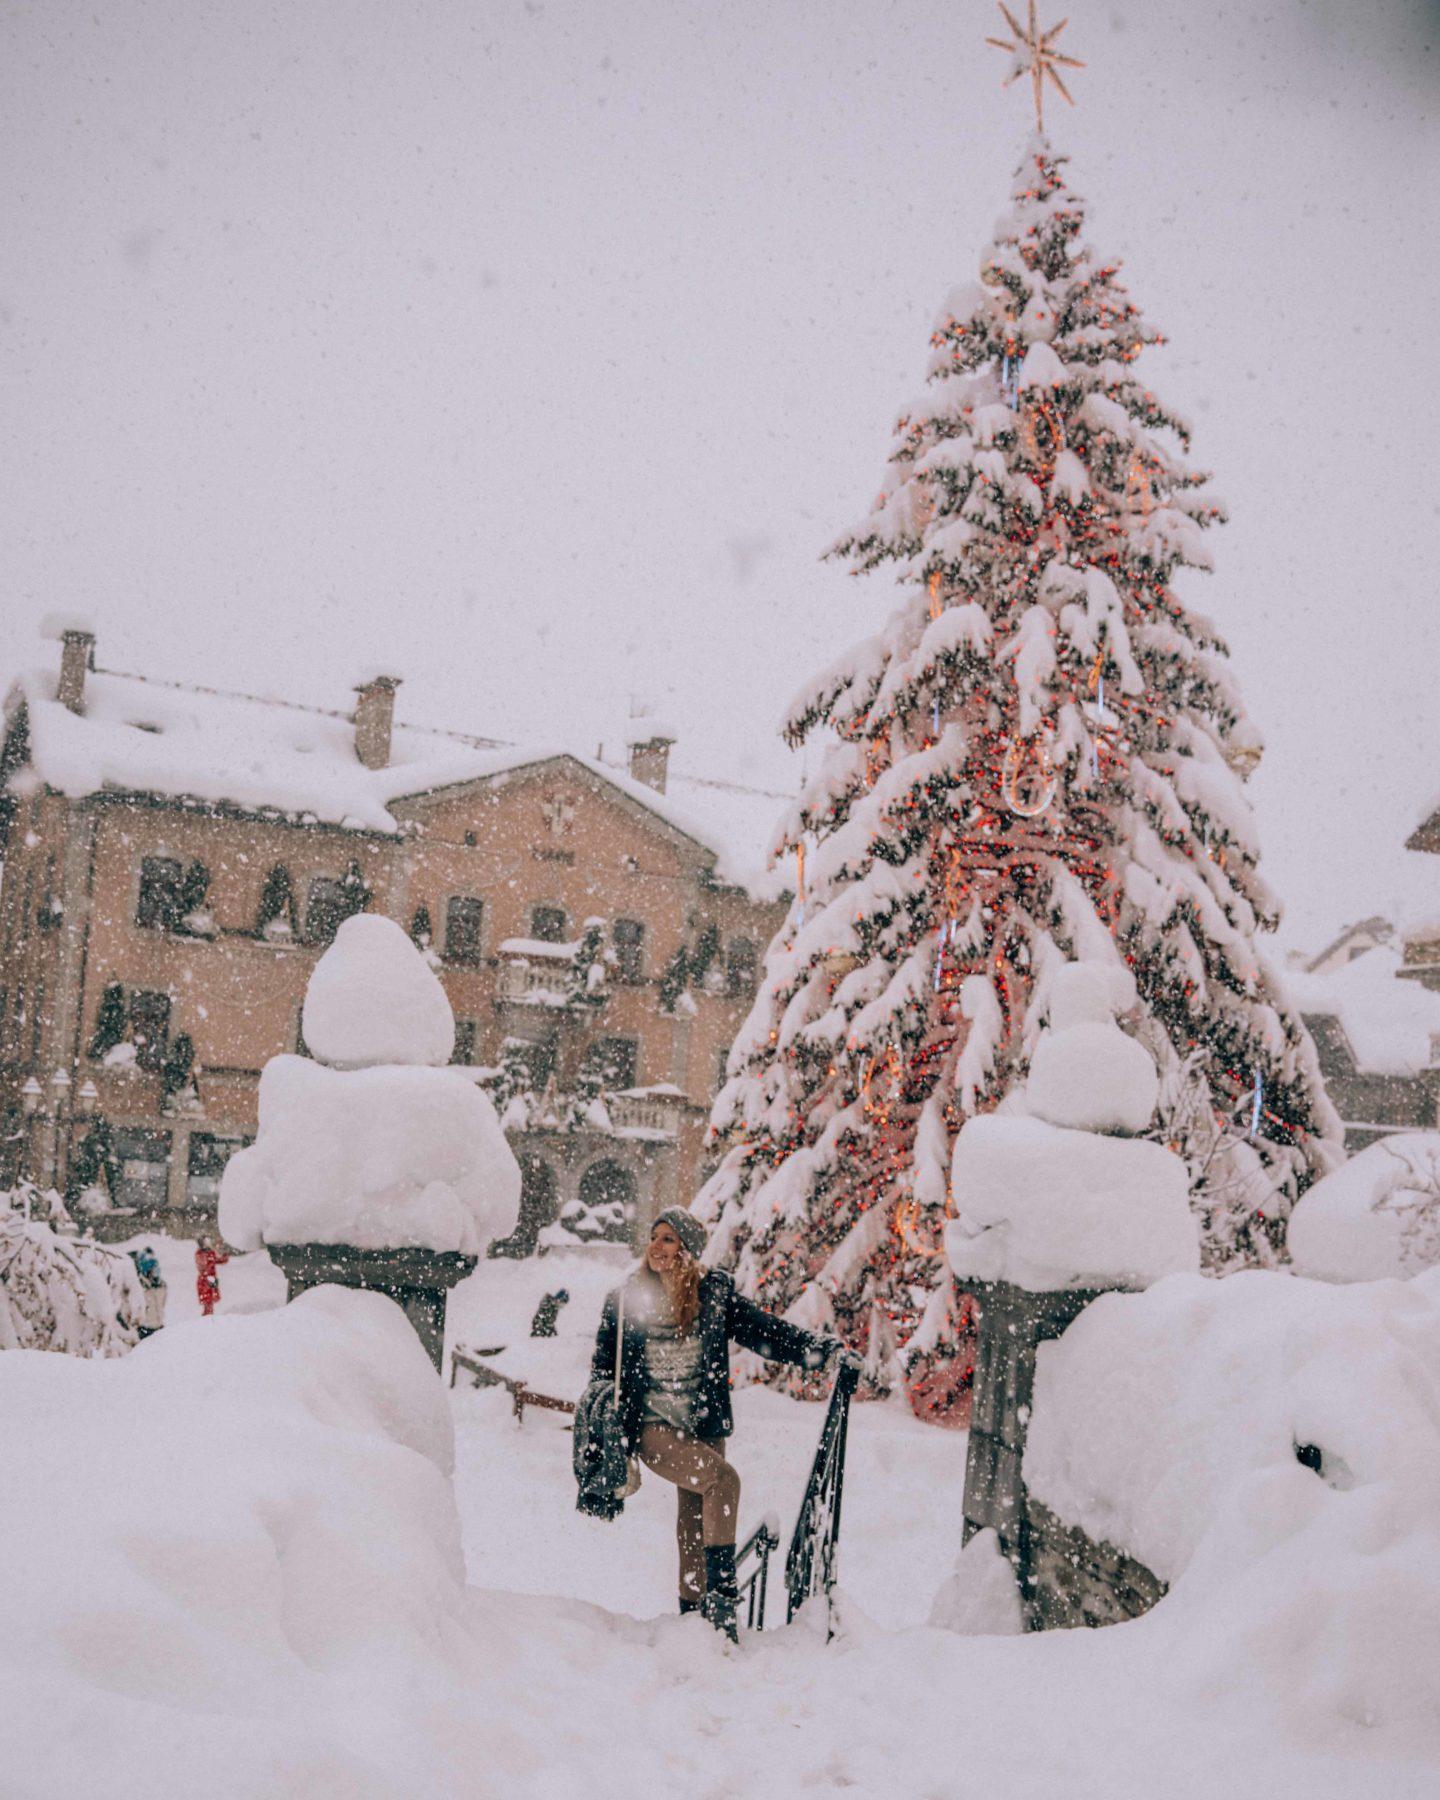 Megeve center under the snow